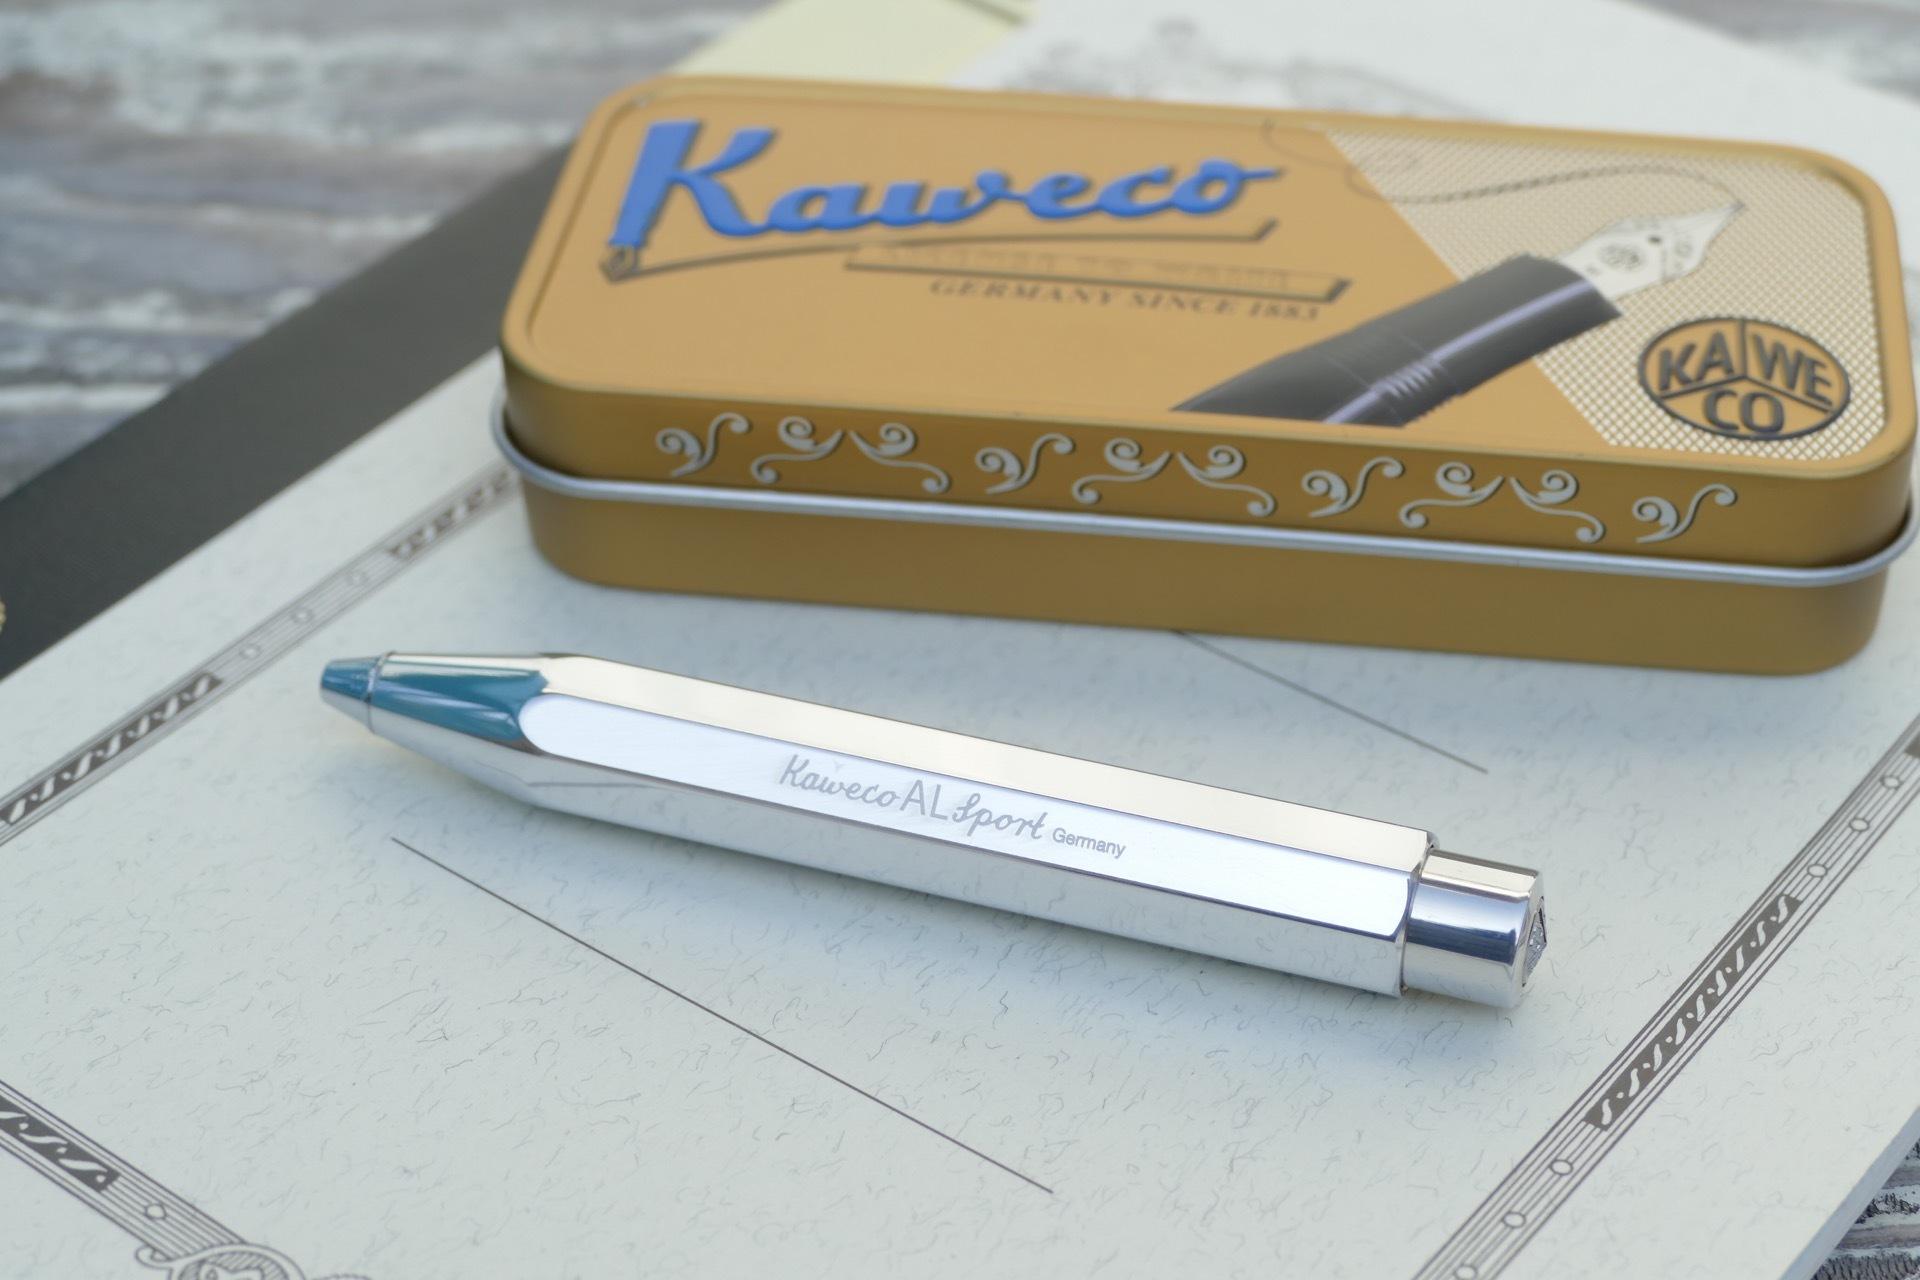 kaweco アルスポーツ ボールペン アルミ